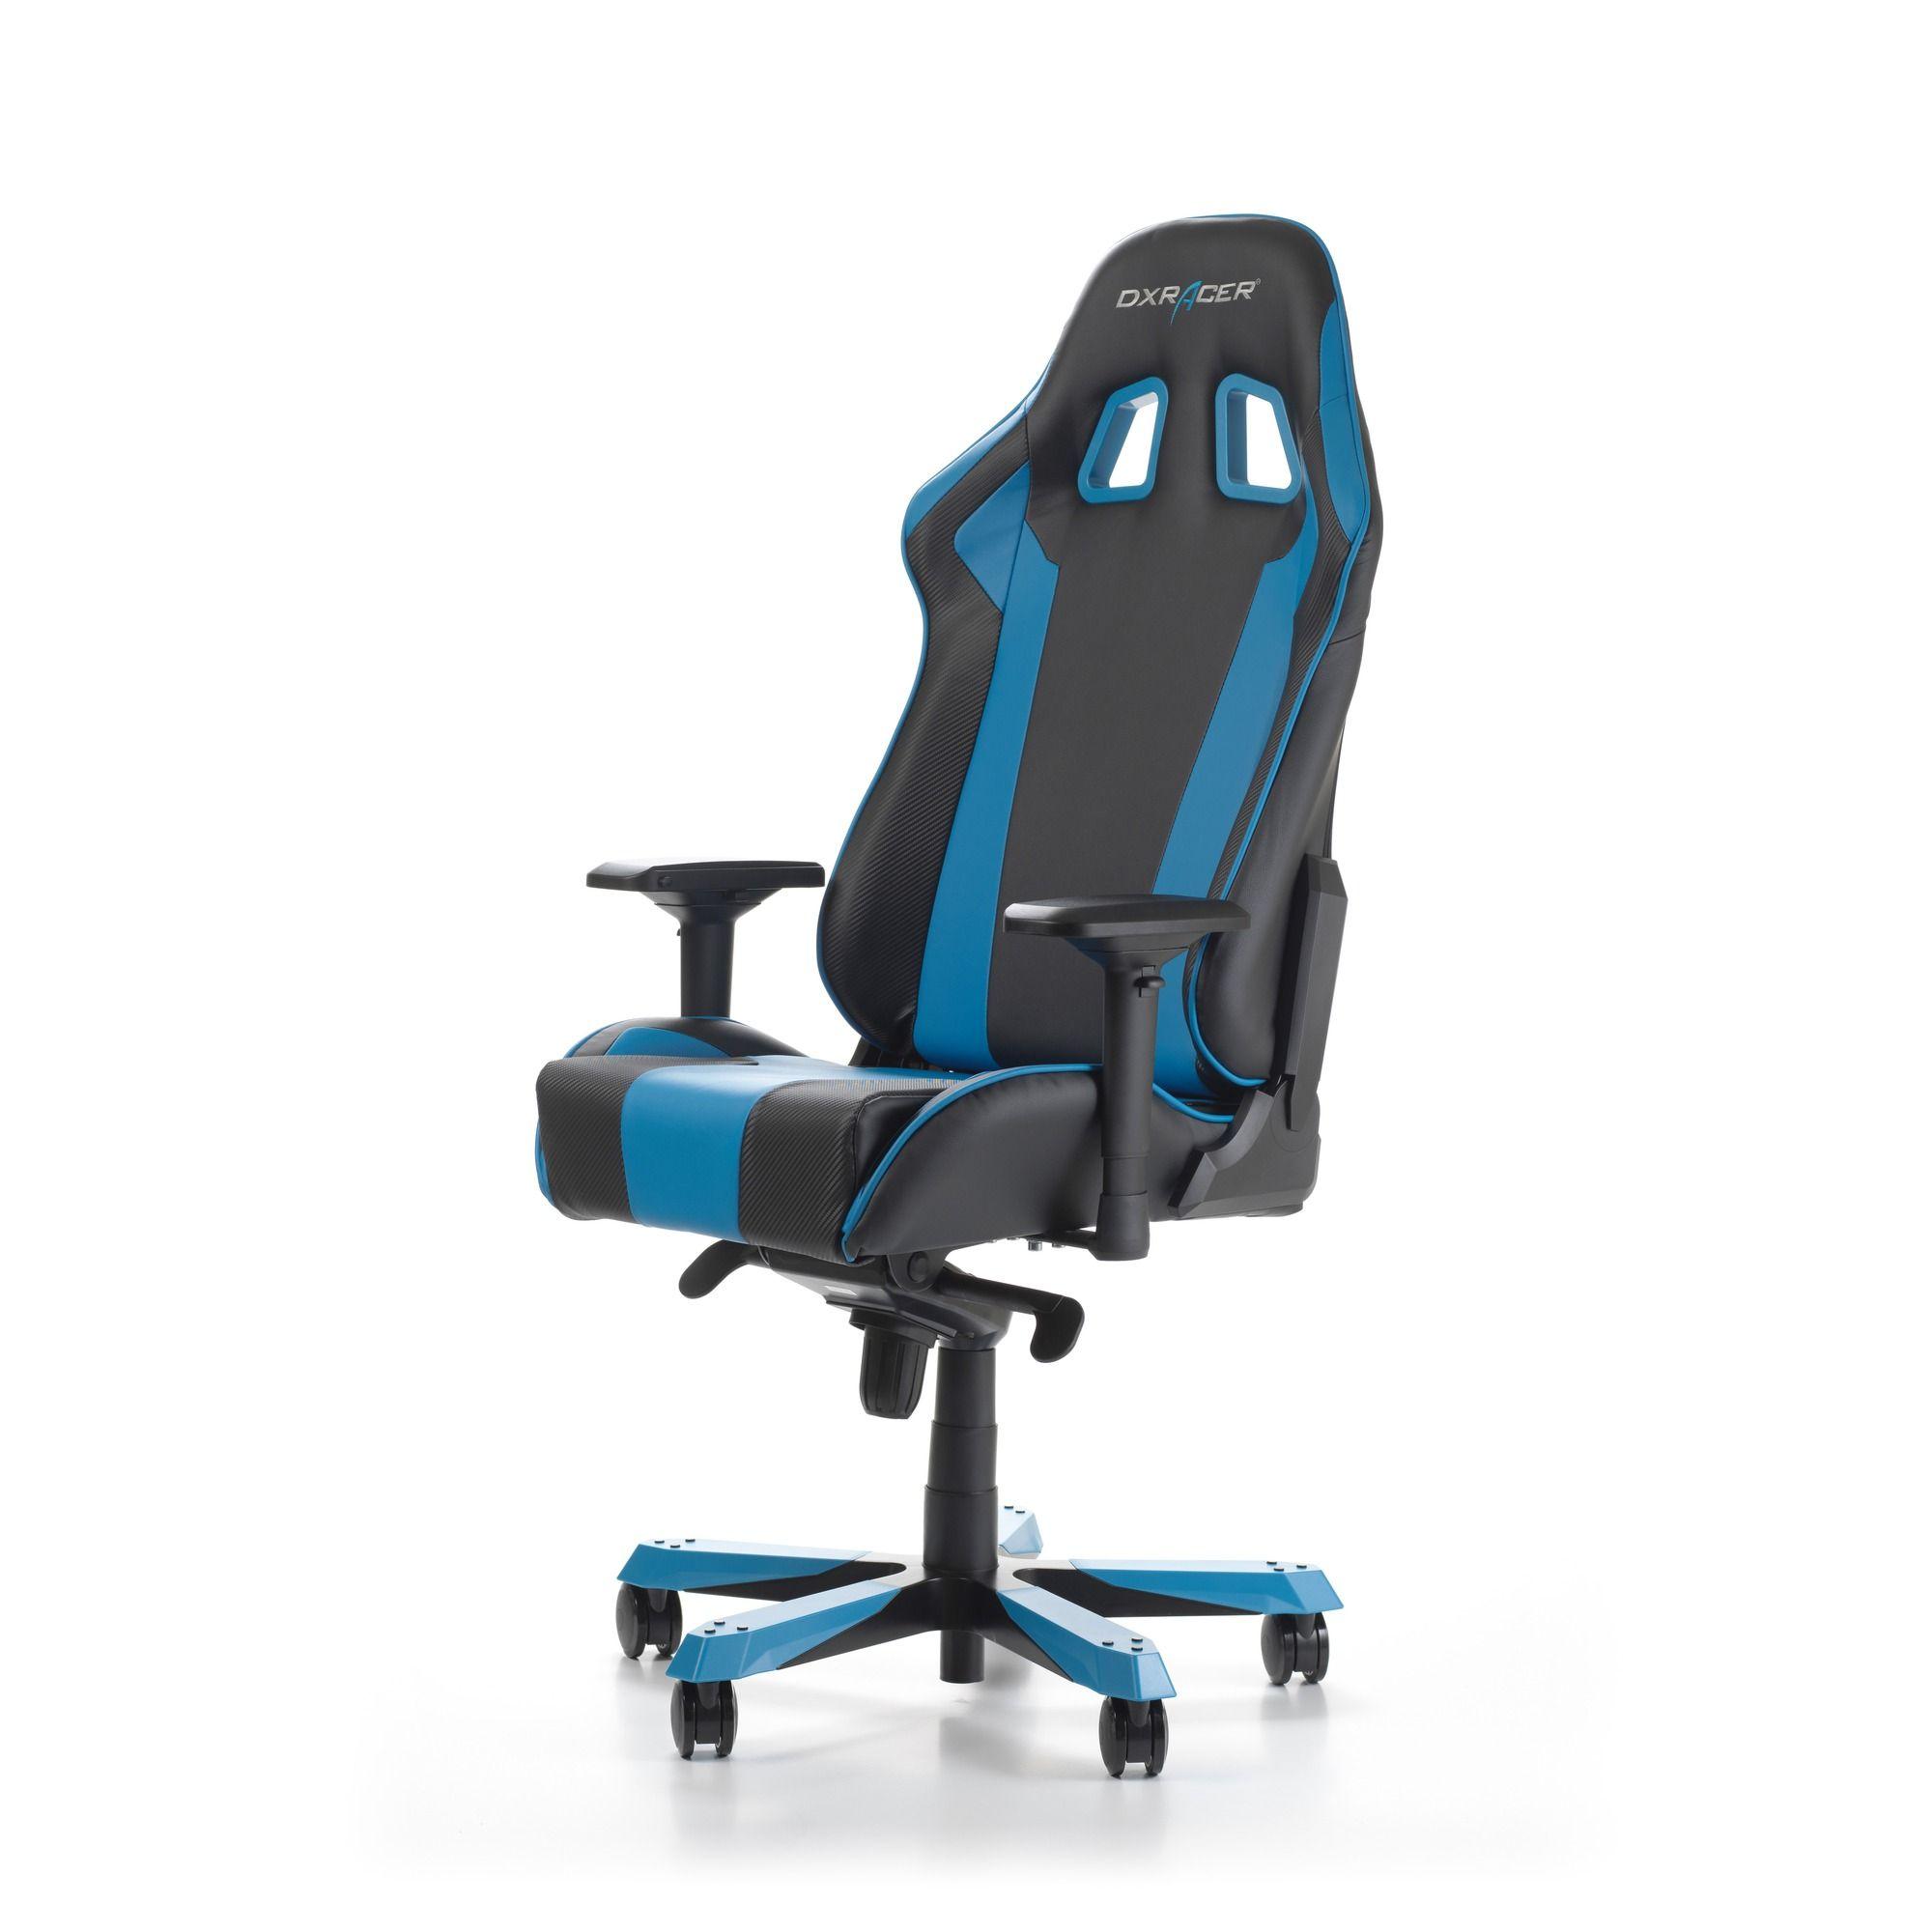 Геймърски стол DXRacer - серия KING, черен/син - OH/KS06/NB - 11